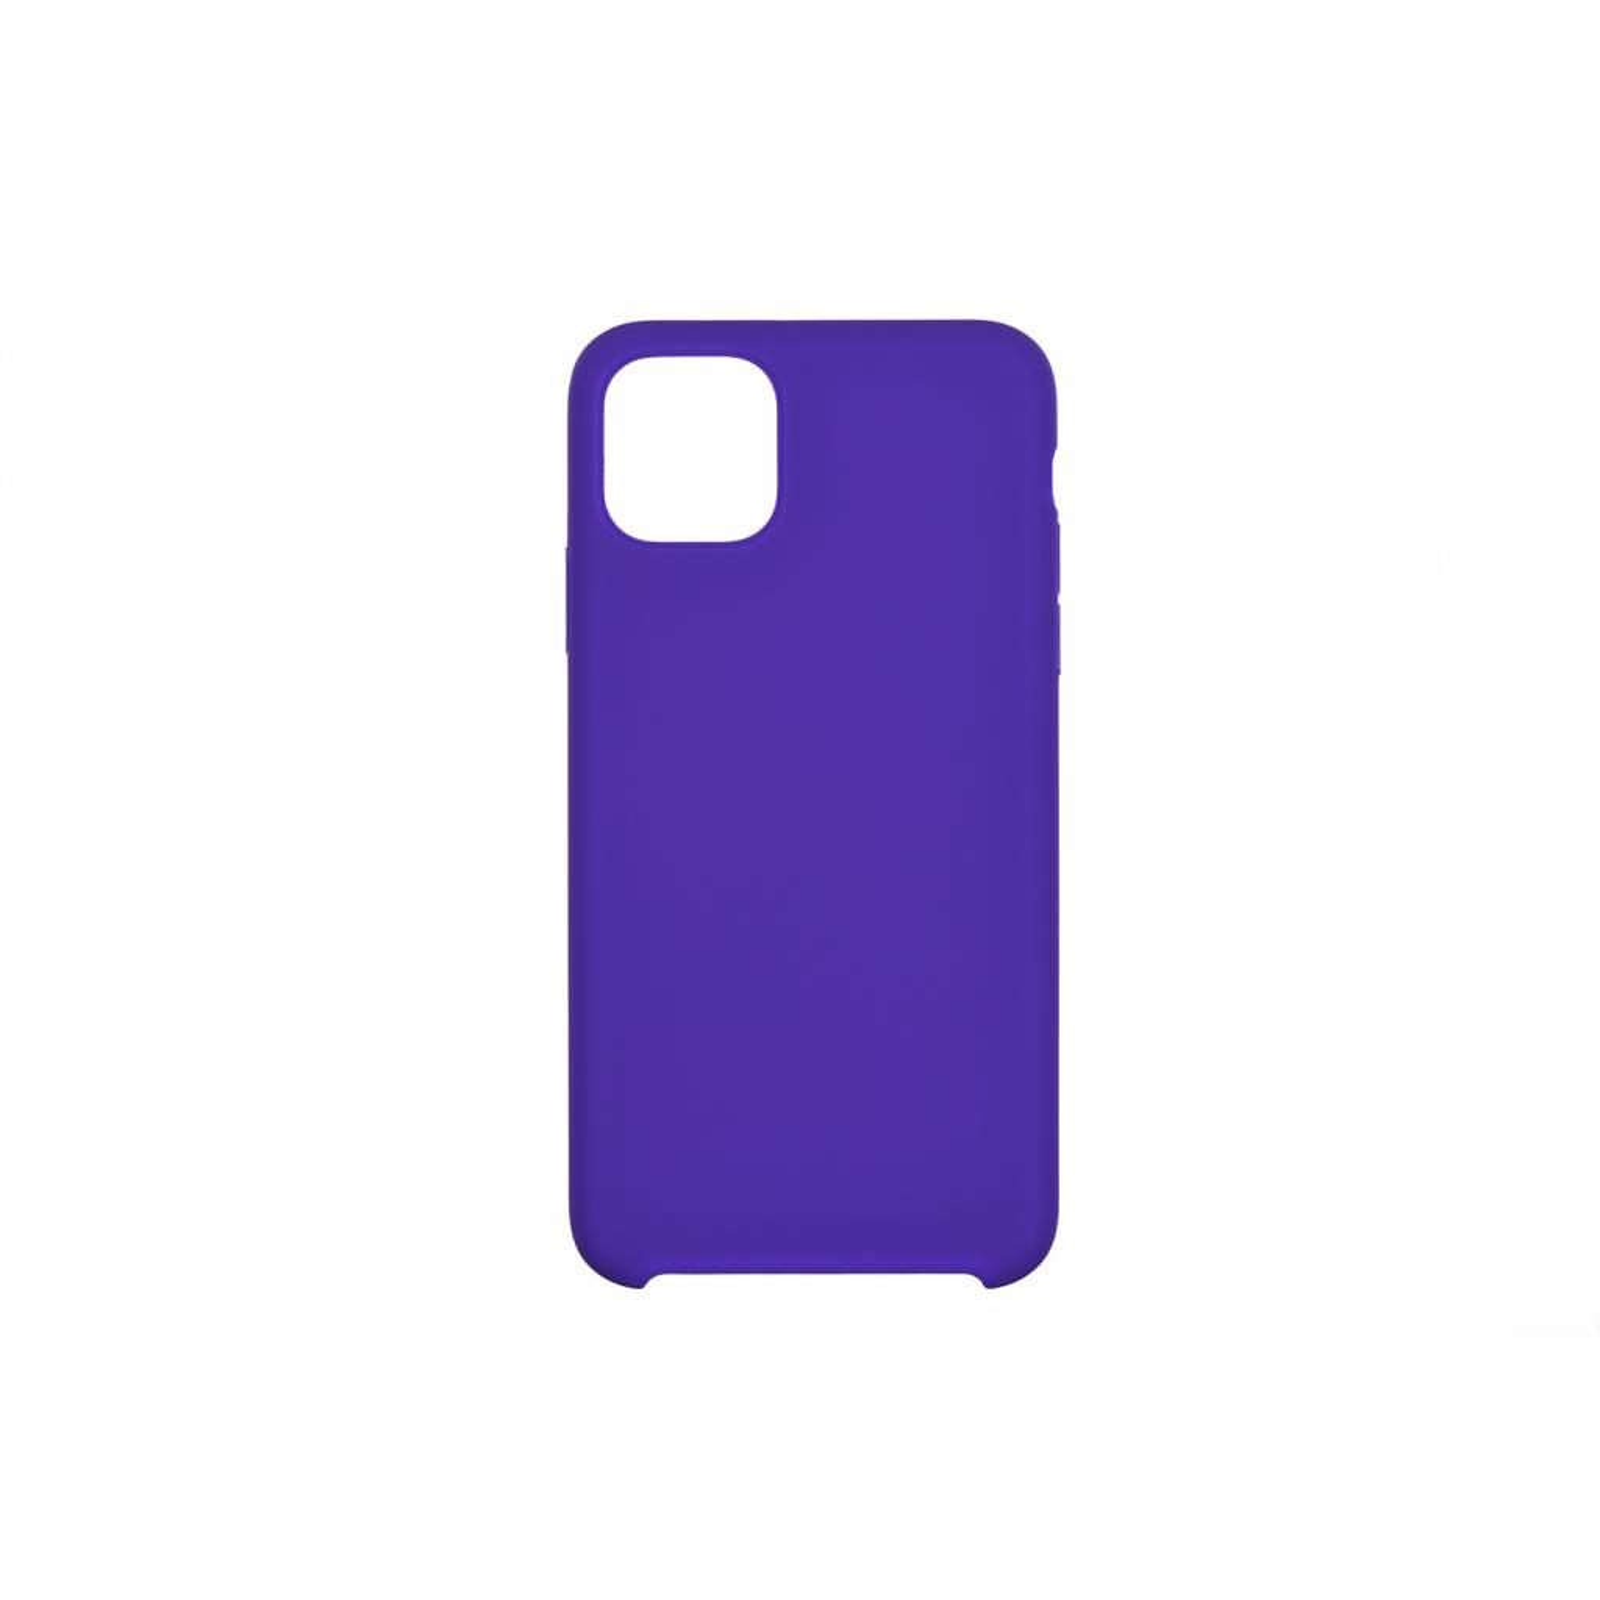 "Чехол для моб. телефона 2E Apple iPhone 11 Pro Max (6.5""), Liquid Silicone, Dark Purple (2E-IPH-11PRM-OCLS-DP)"